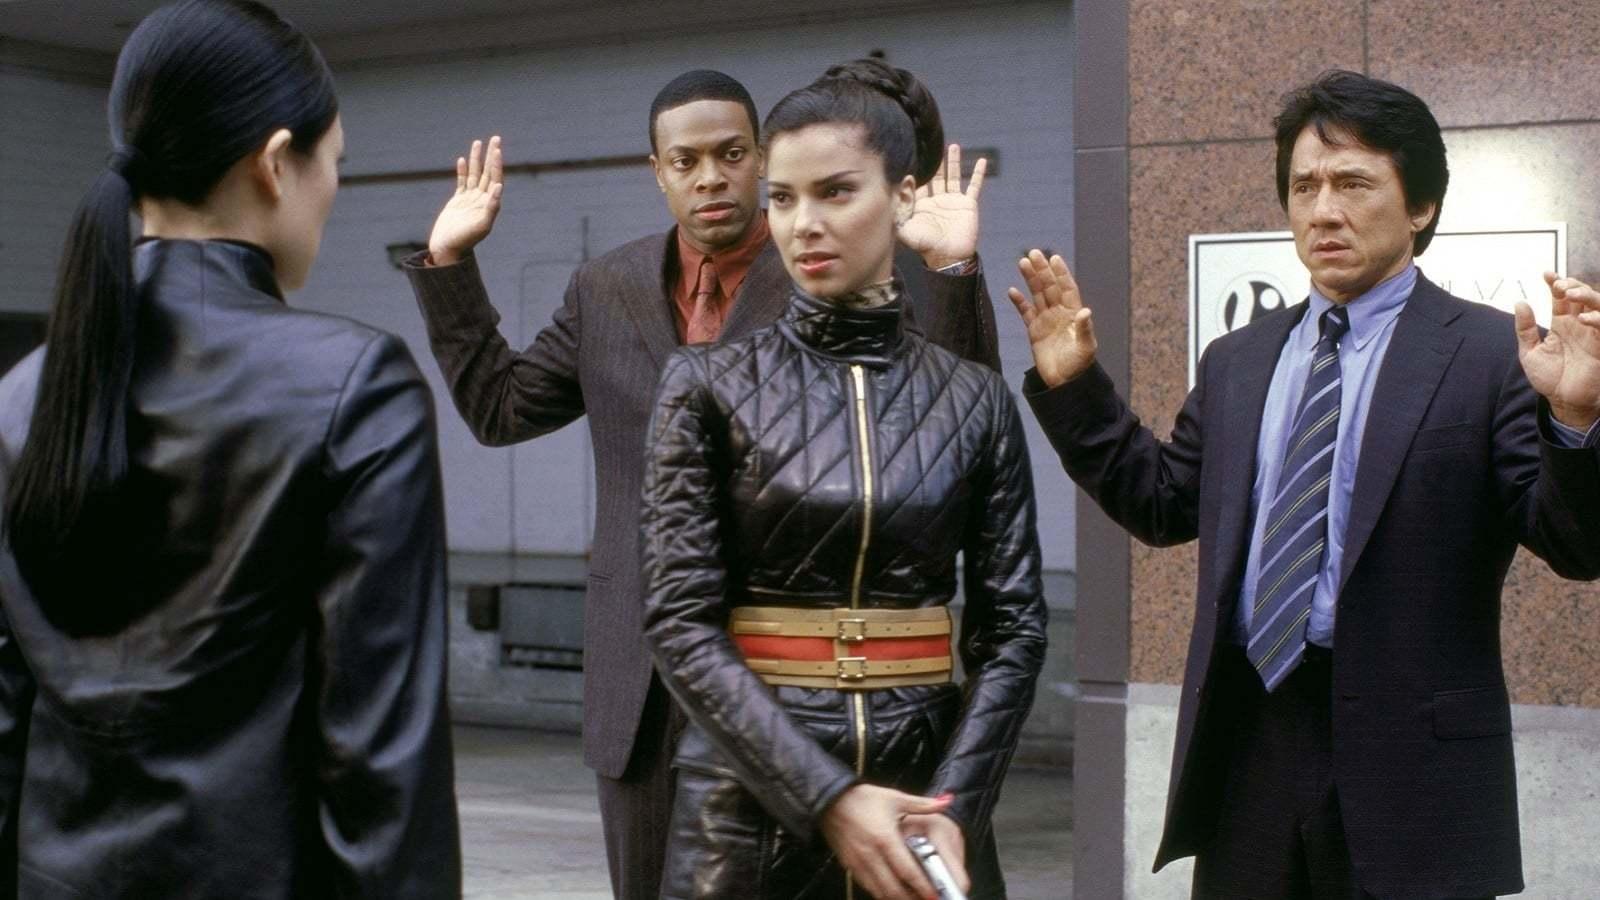 Кадры из фильма Час пик 2 Rush Hour2 2001